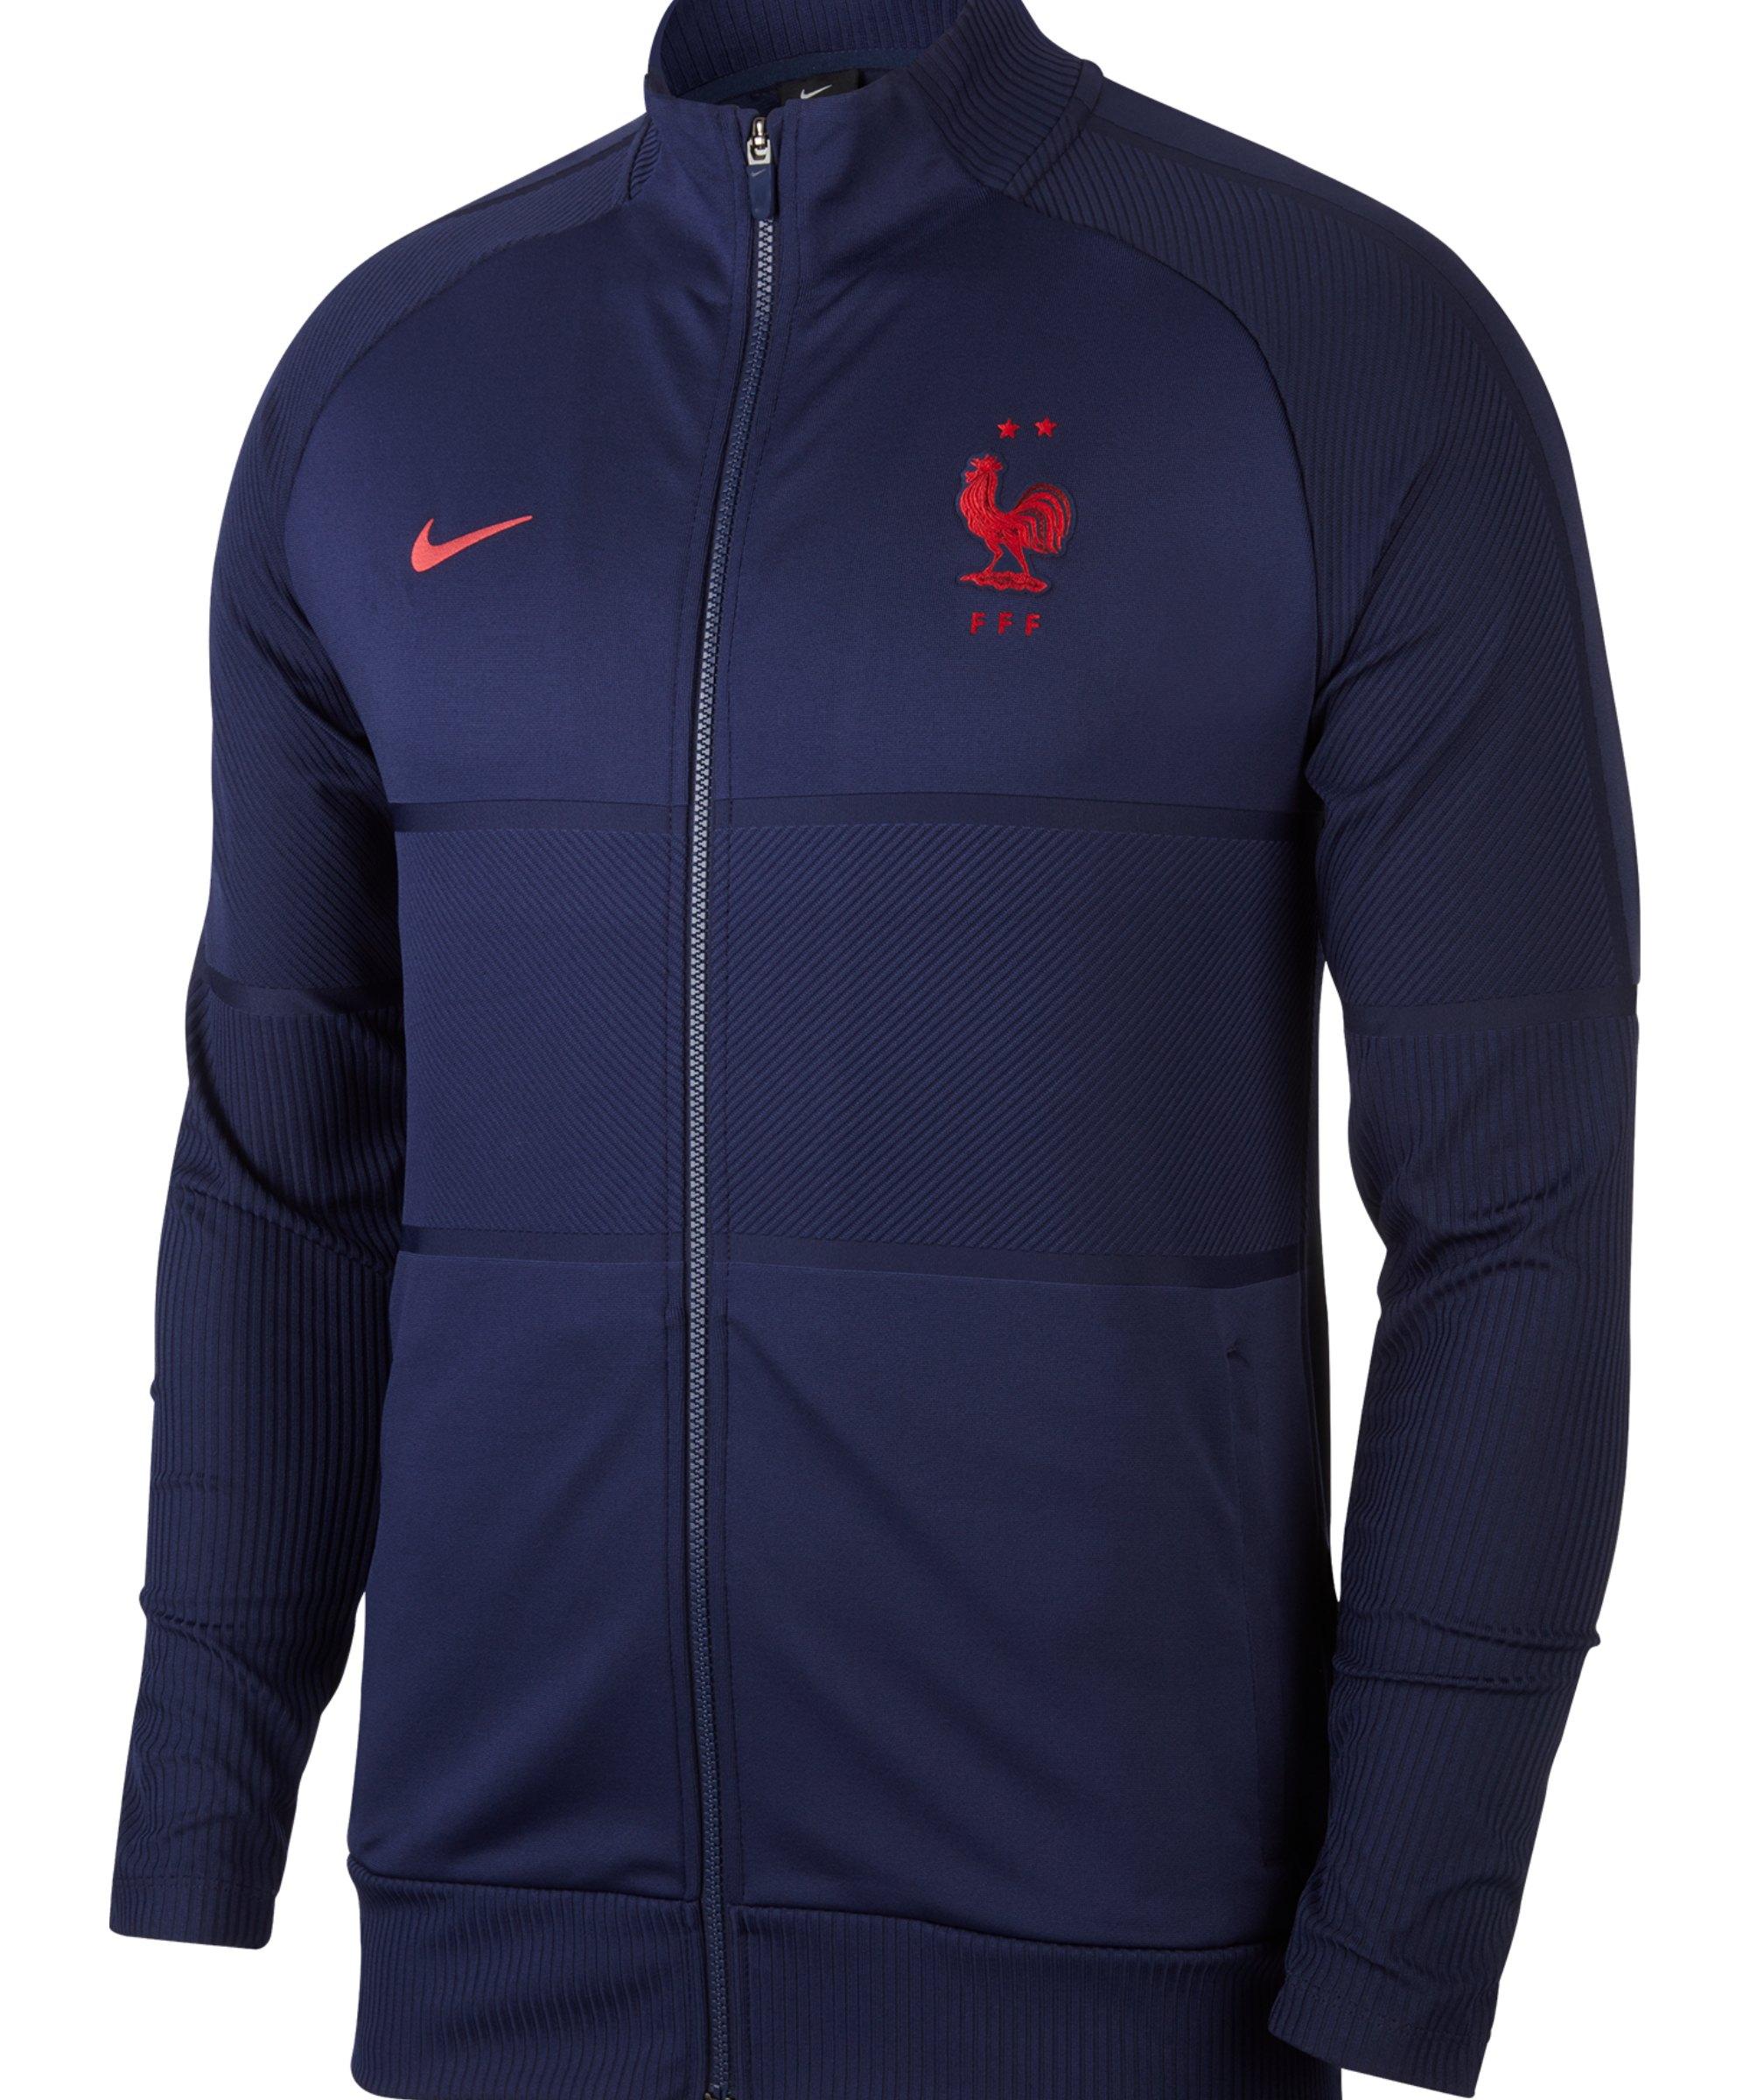 Nike Frankreich I96 Trainingsjacke Blau F498 - blau